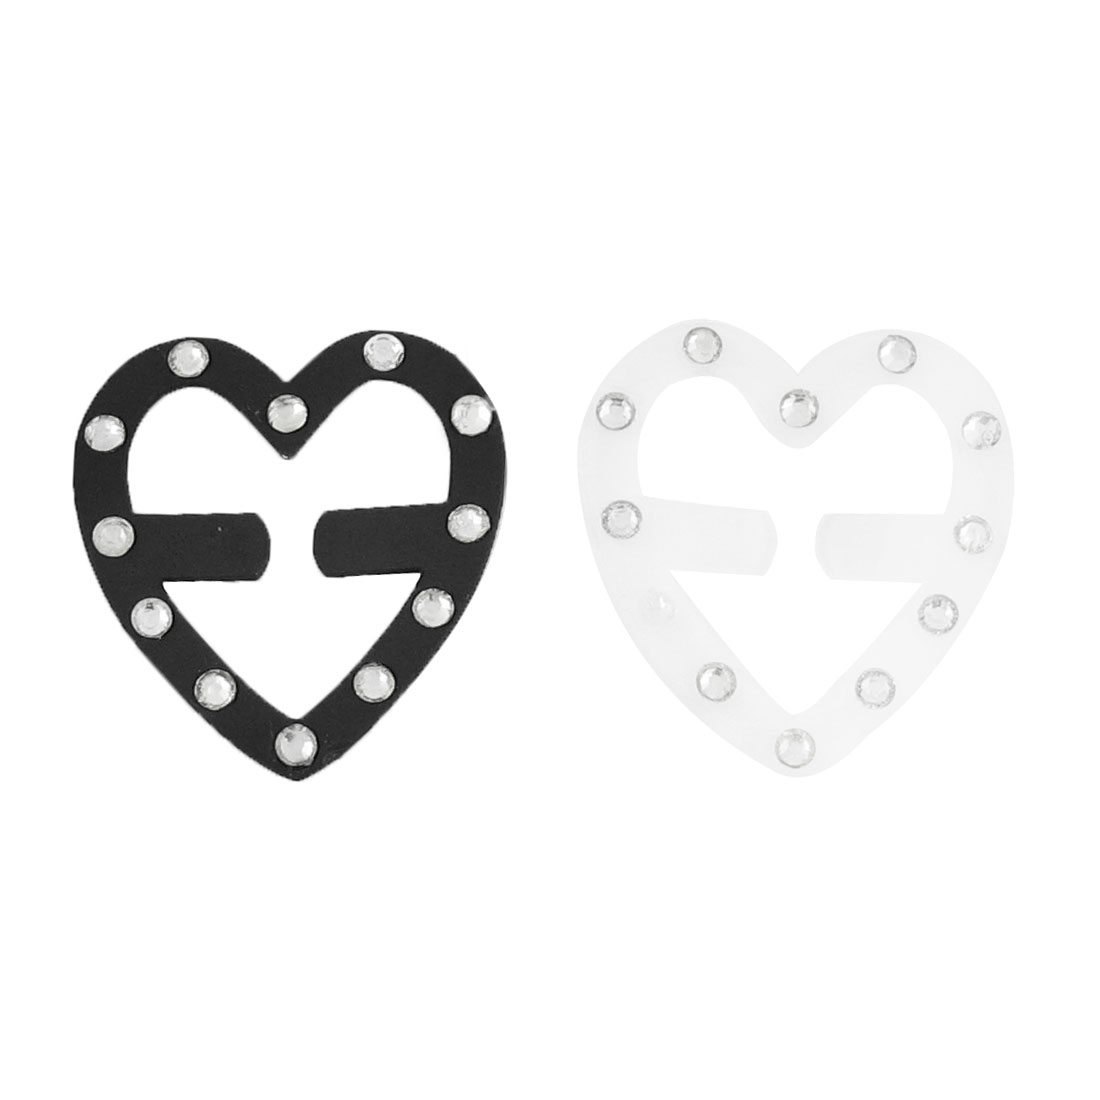 Faux Rhinestone Decor Heart Shape Black Clear Plastic Bra Strap Clip 2 Pcs